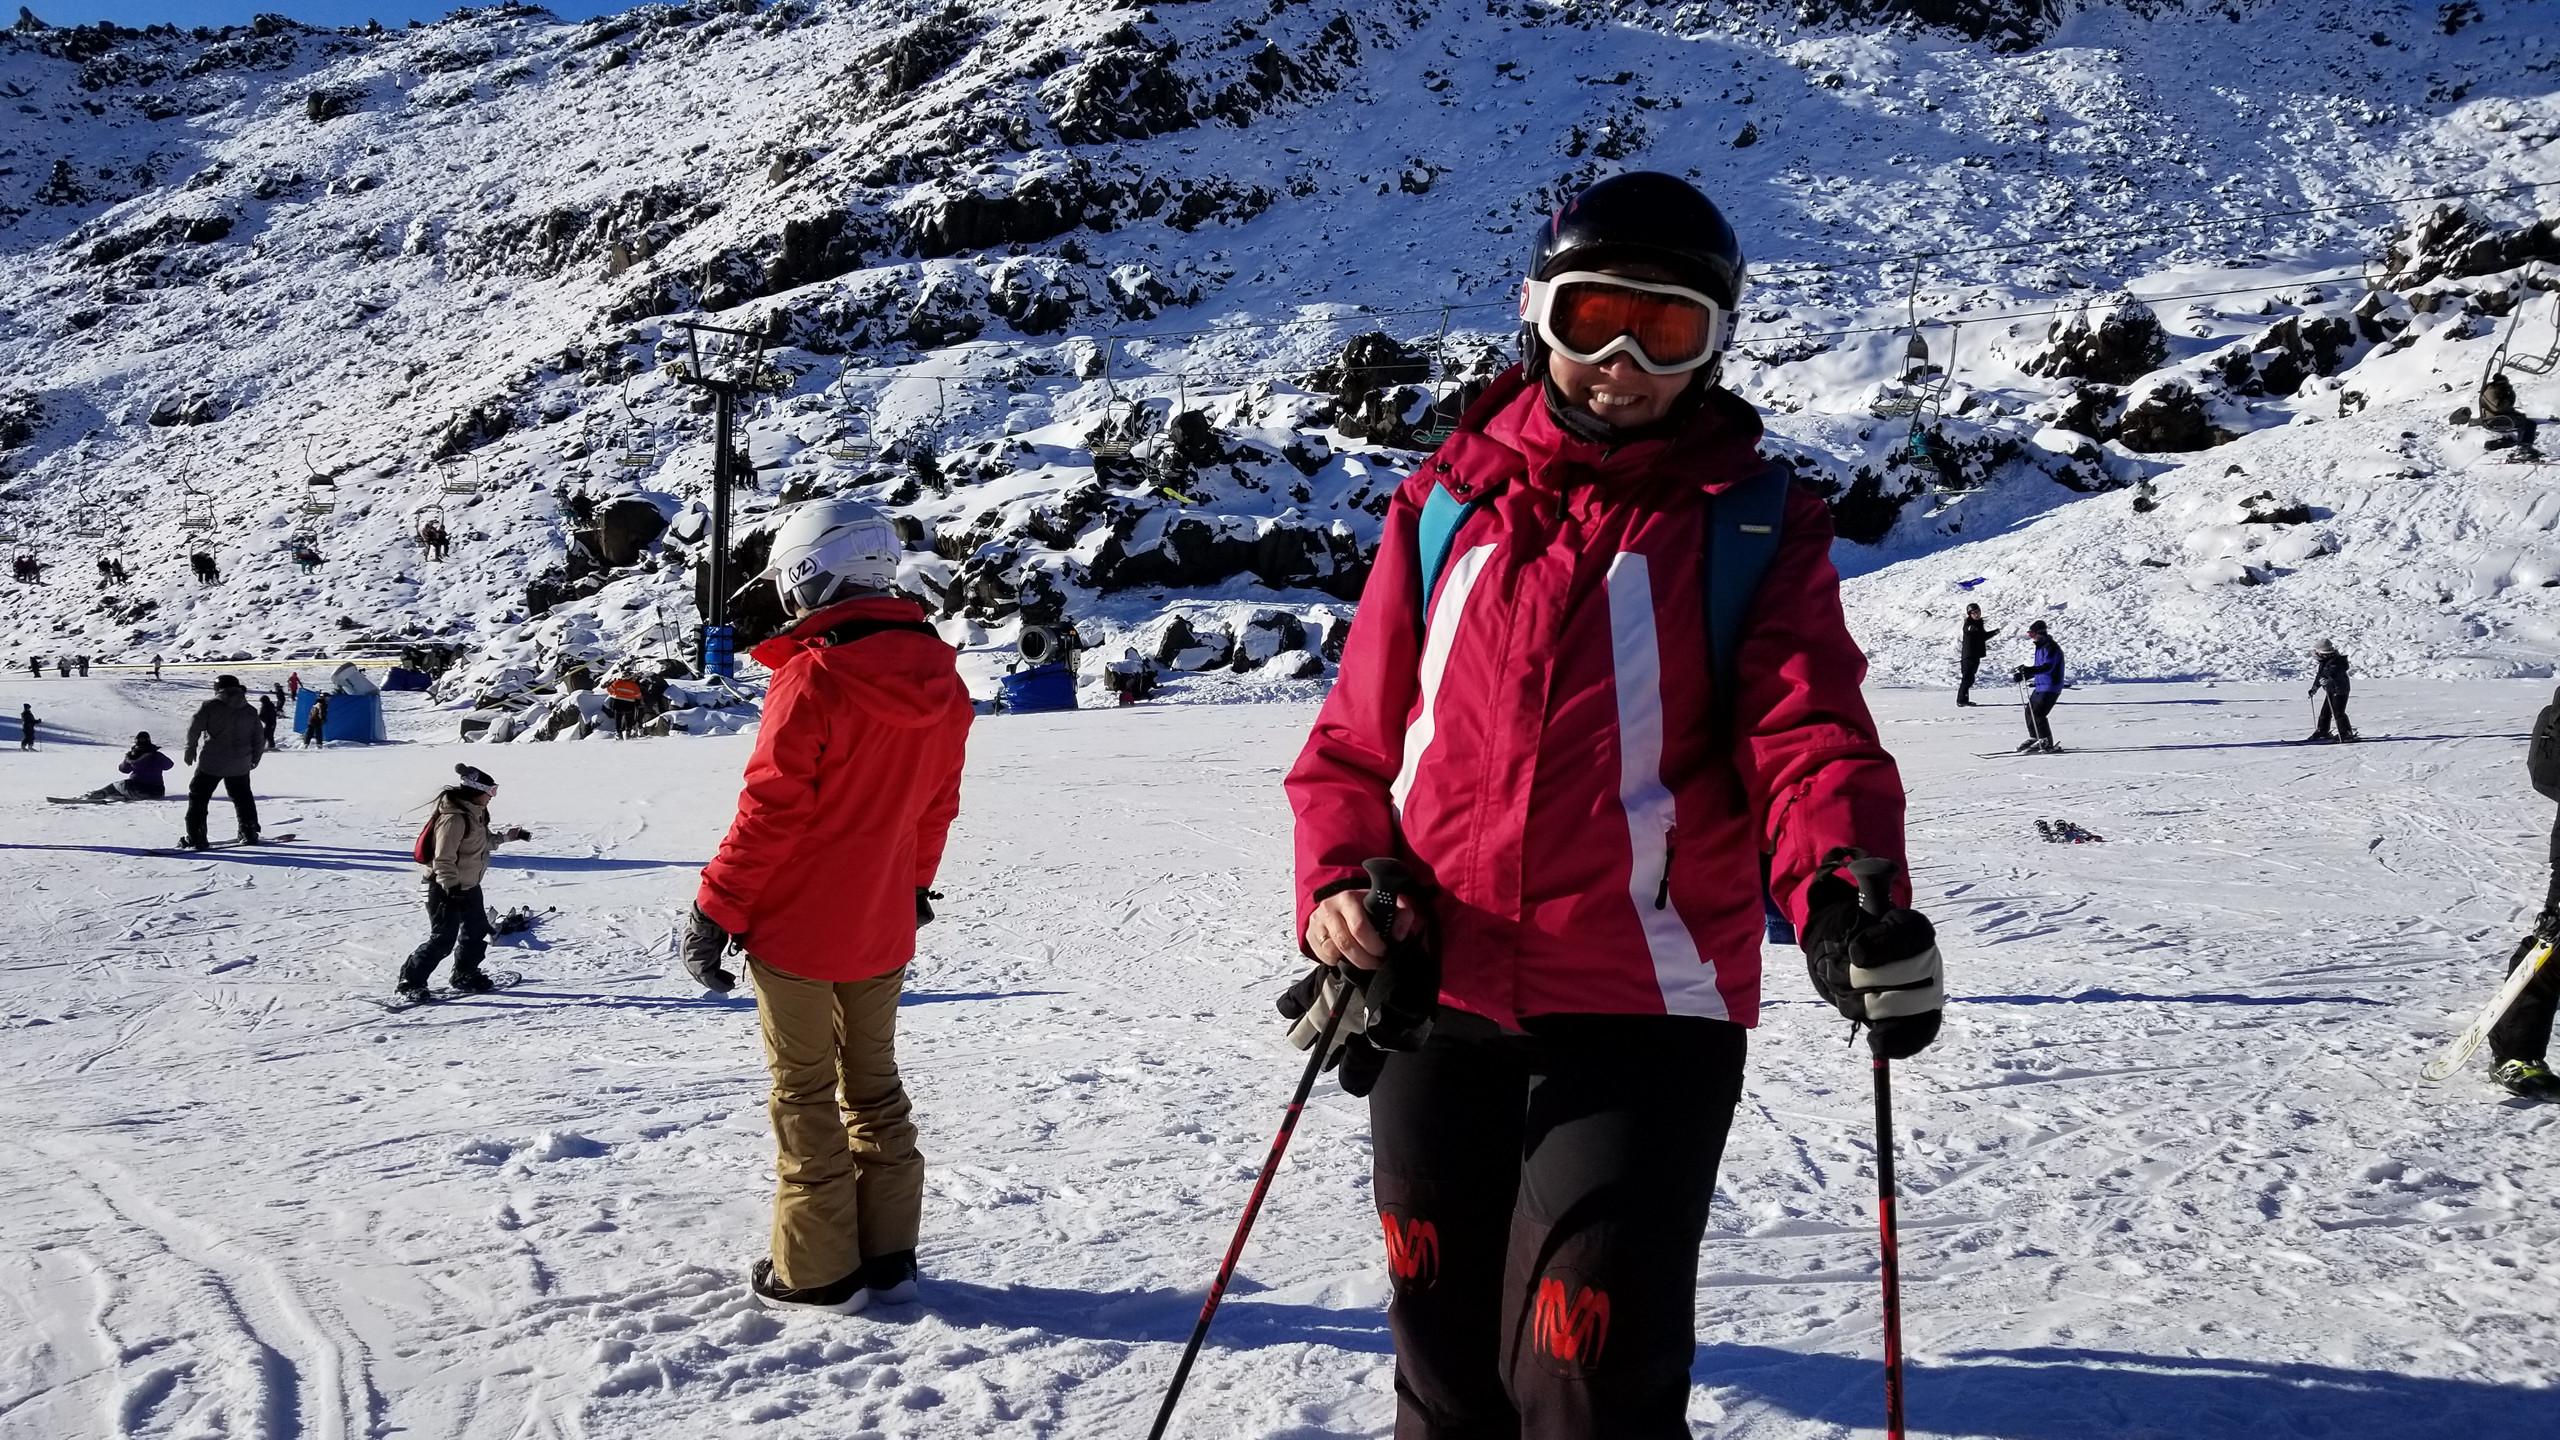 Cardrona Ski Field Queenstown New Zealand